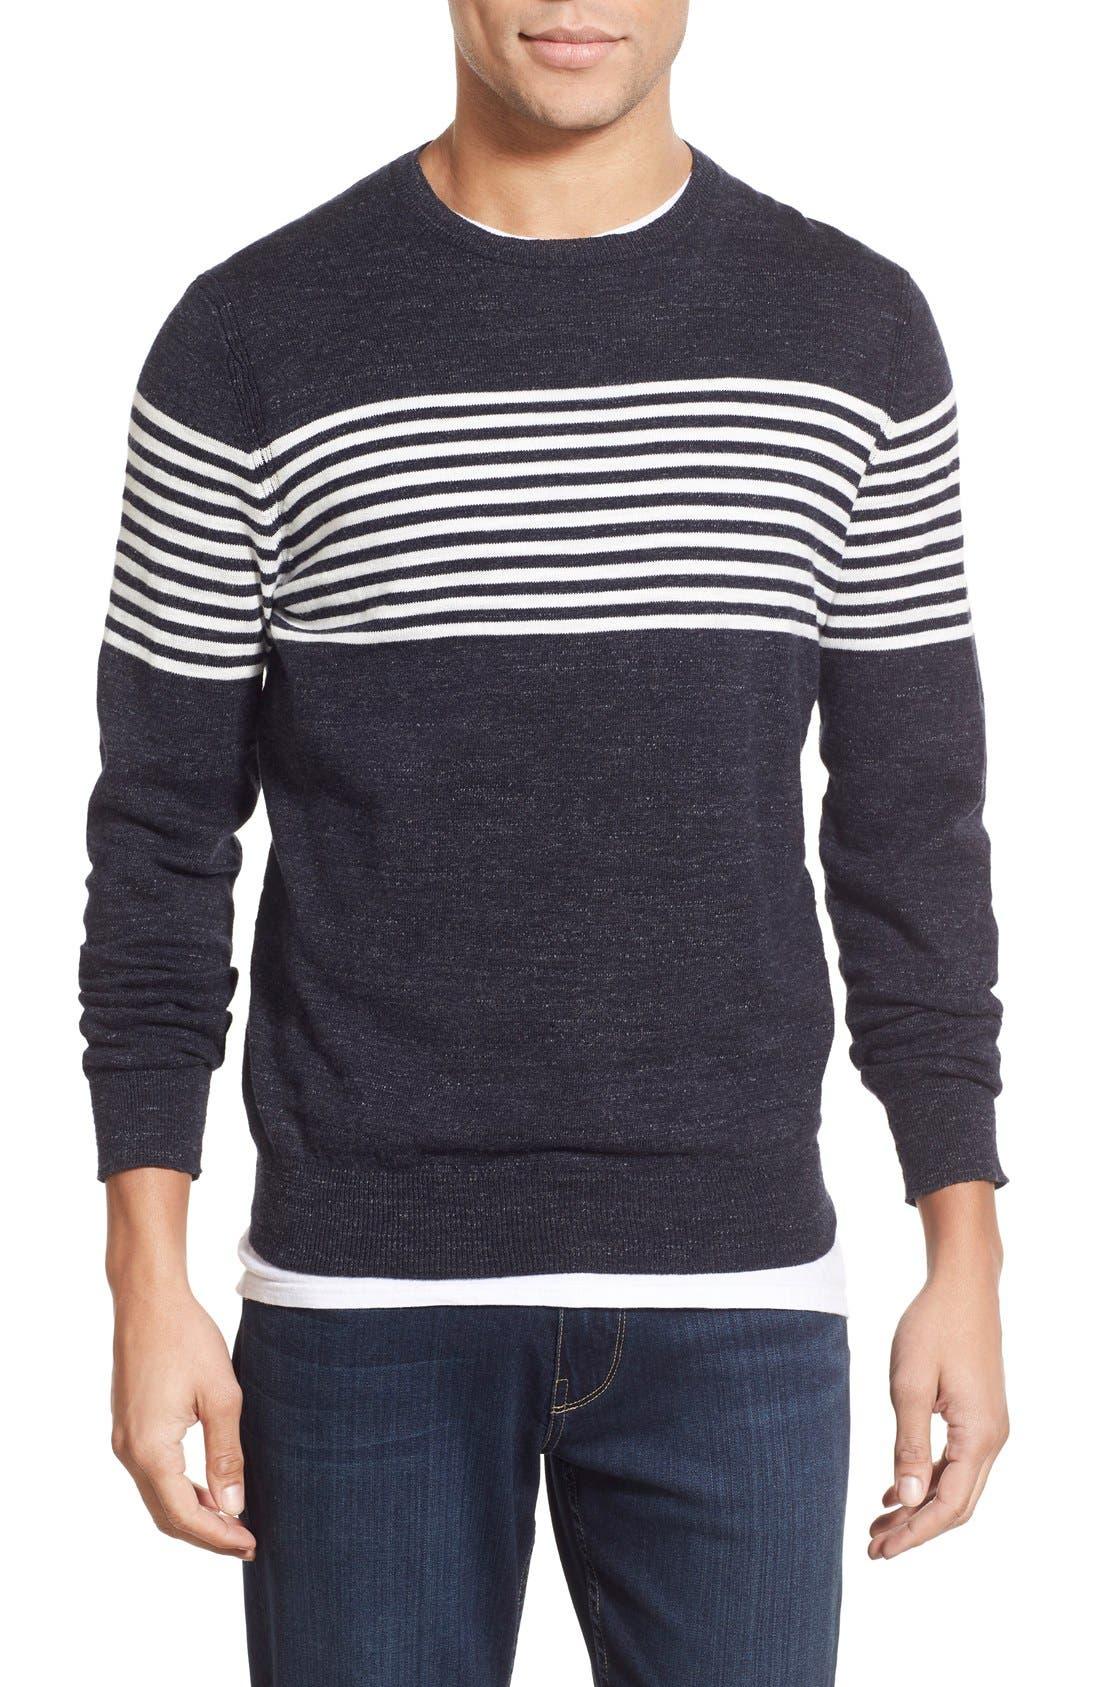 Main Image - Grayers 'Shore Club' Chest Stripe Crewneck Sweater